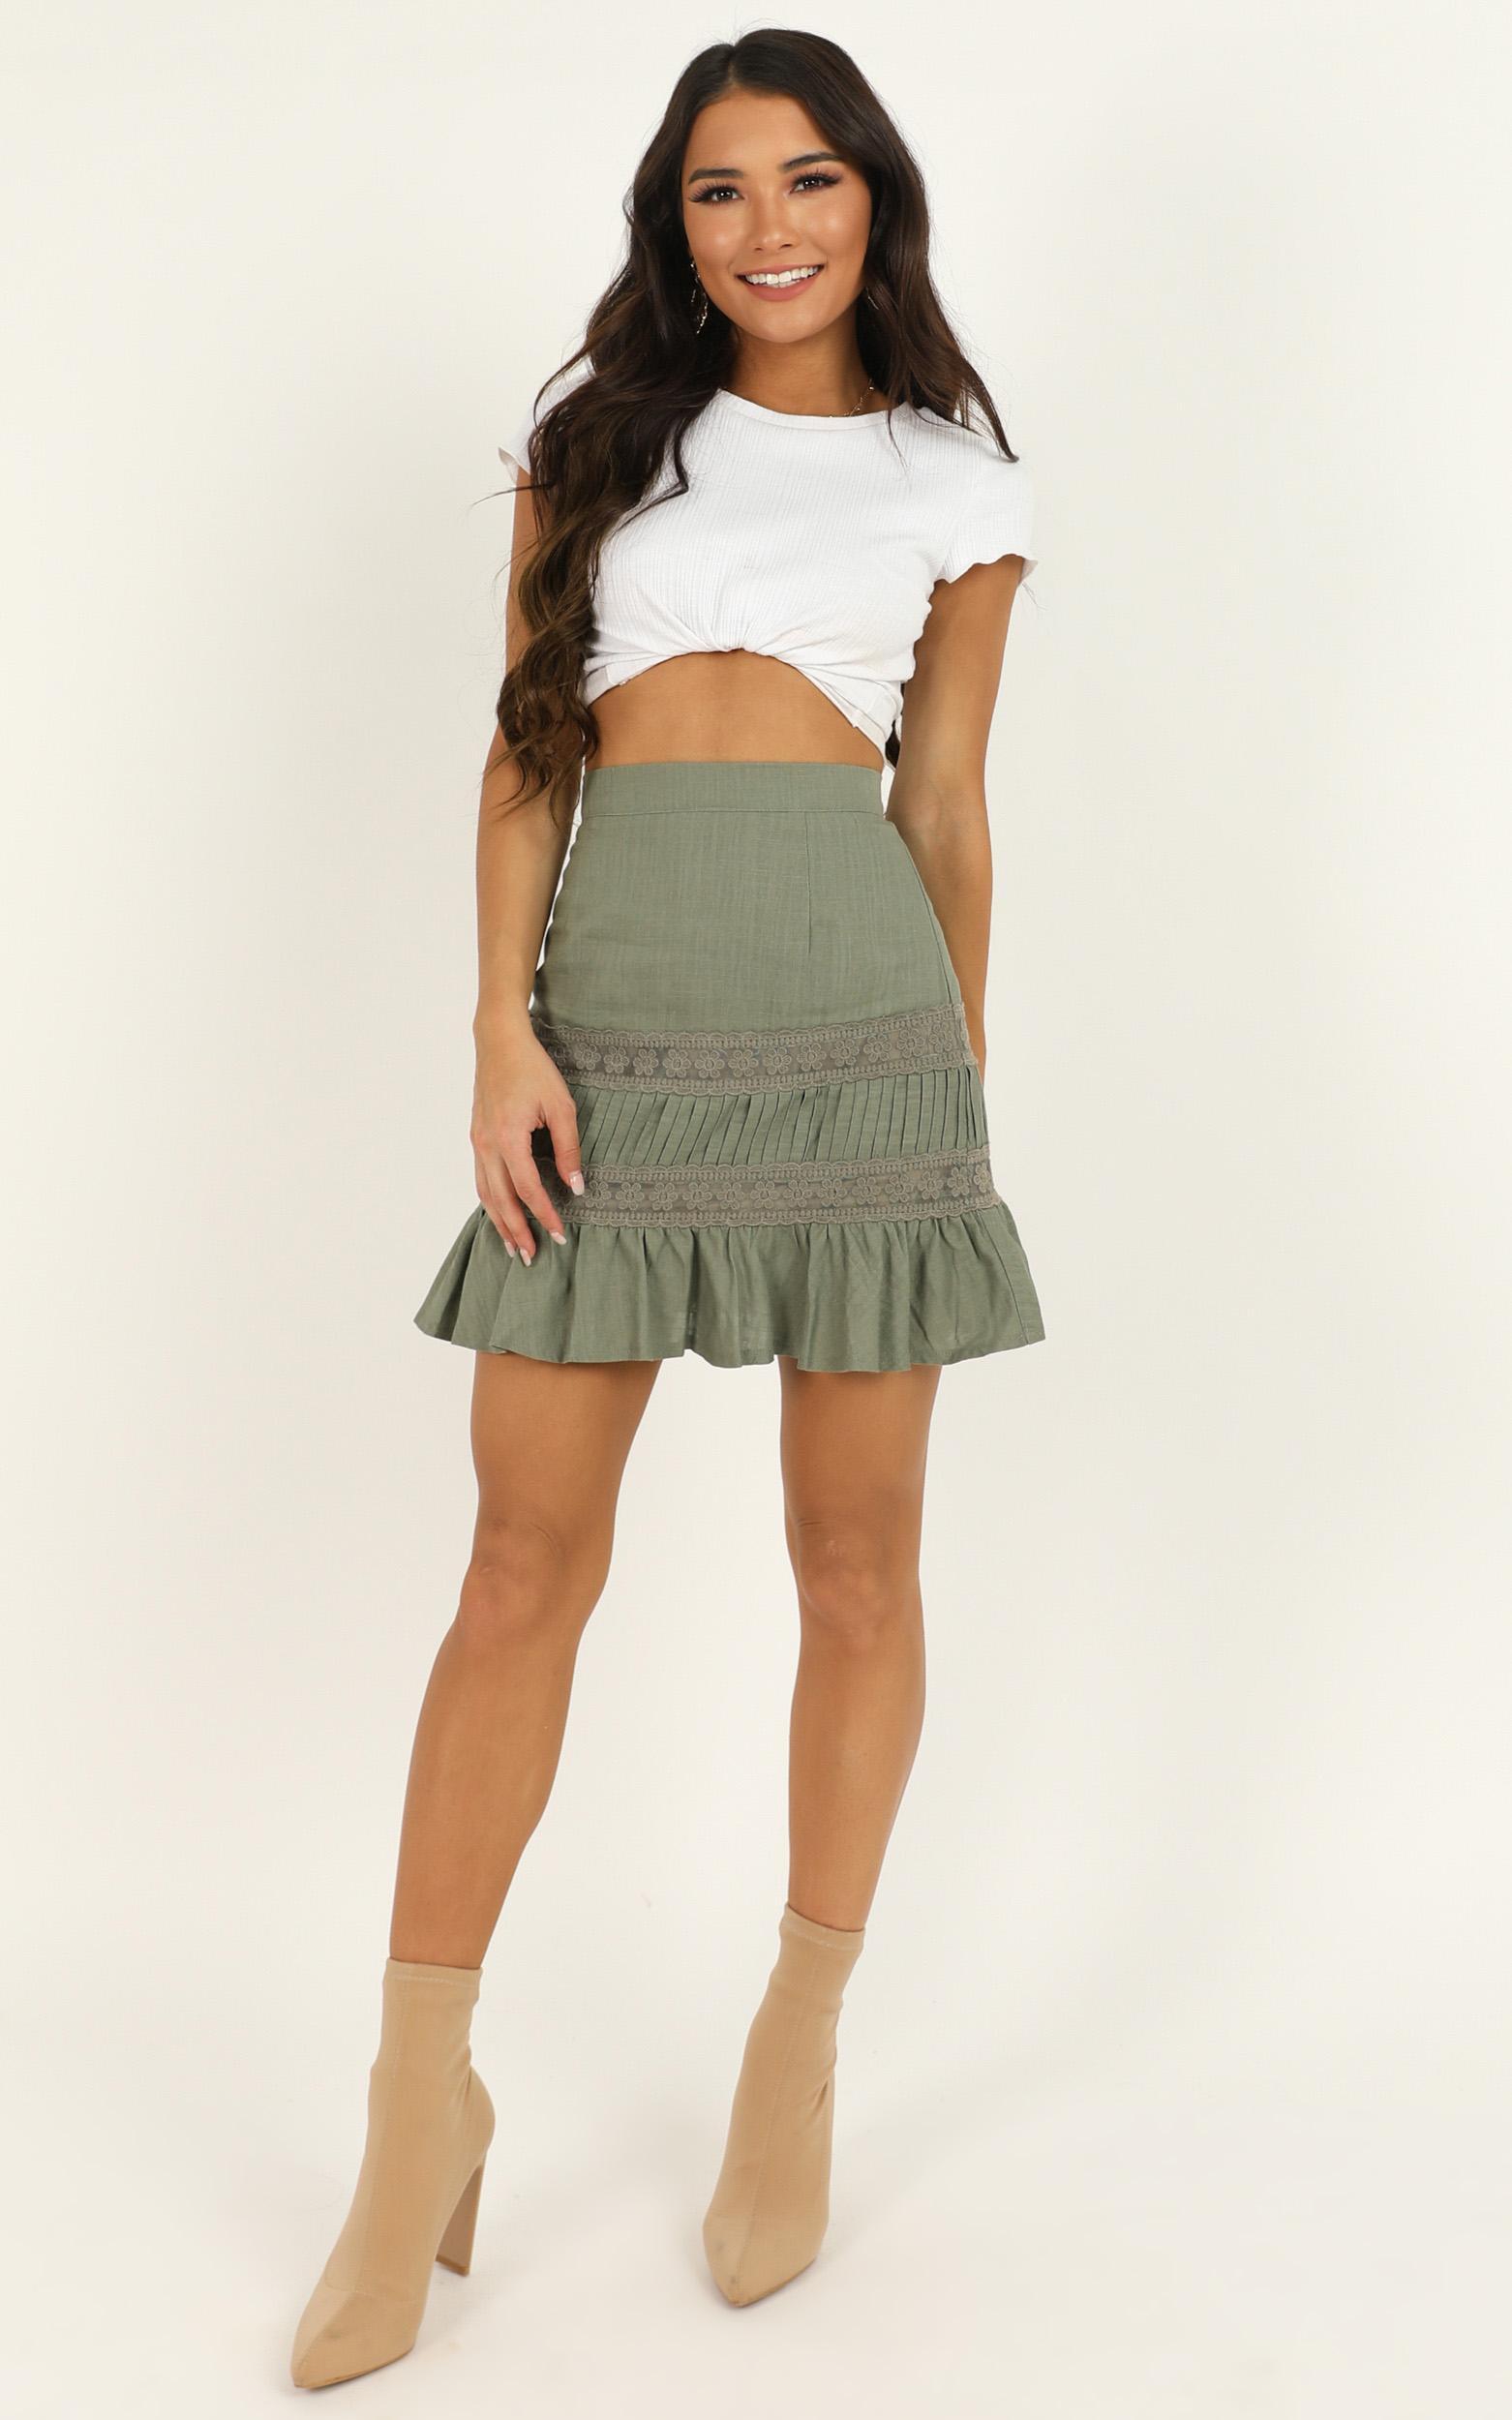 Leave It Here Skirt in khaki linen look  - 18 (XXXL), Khaki, hi-res image number null